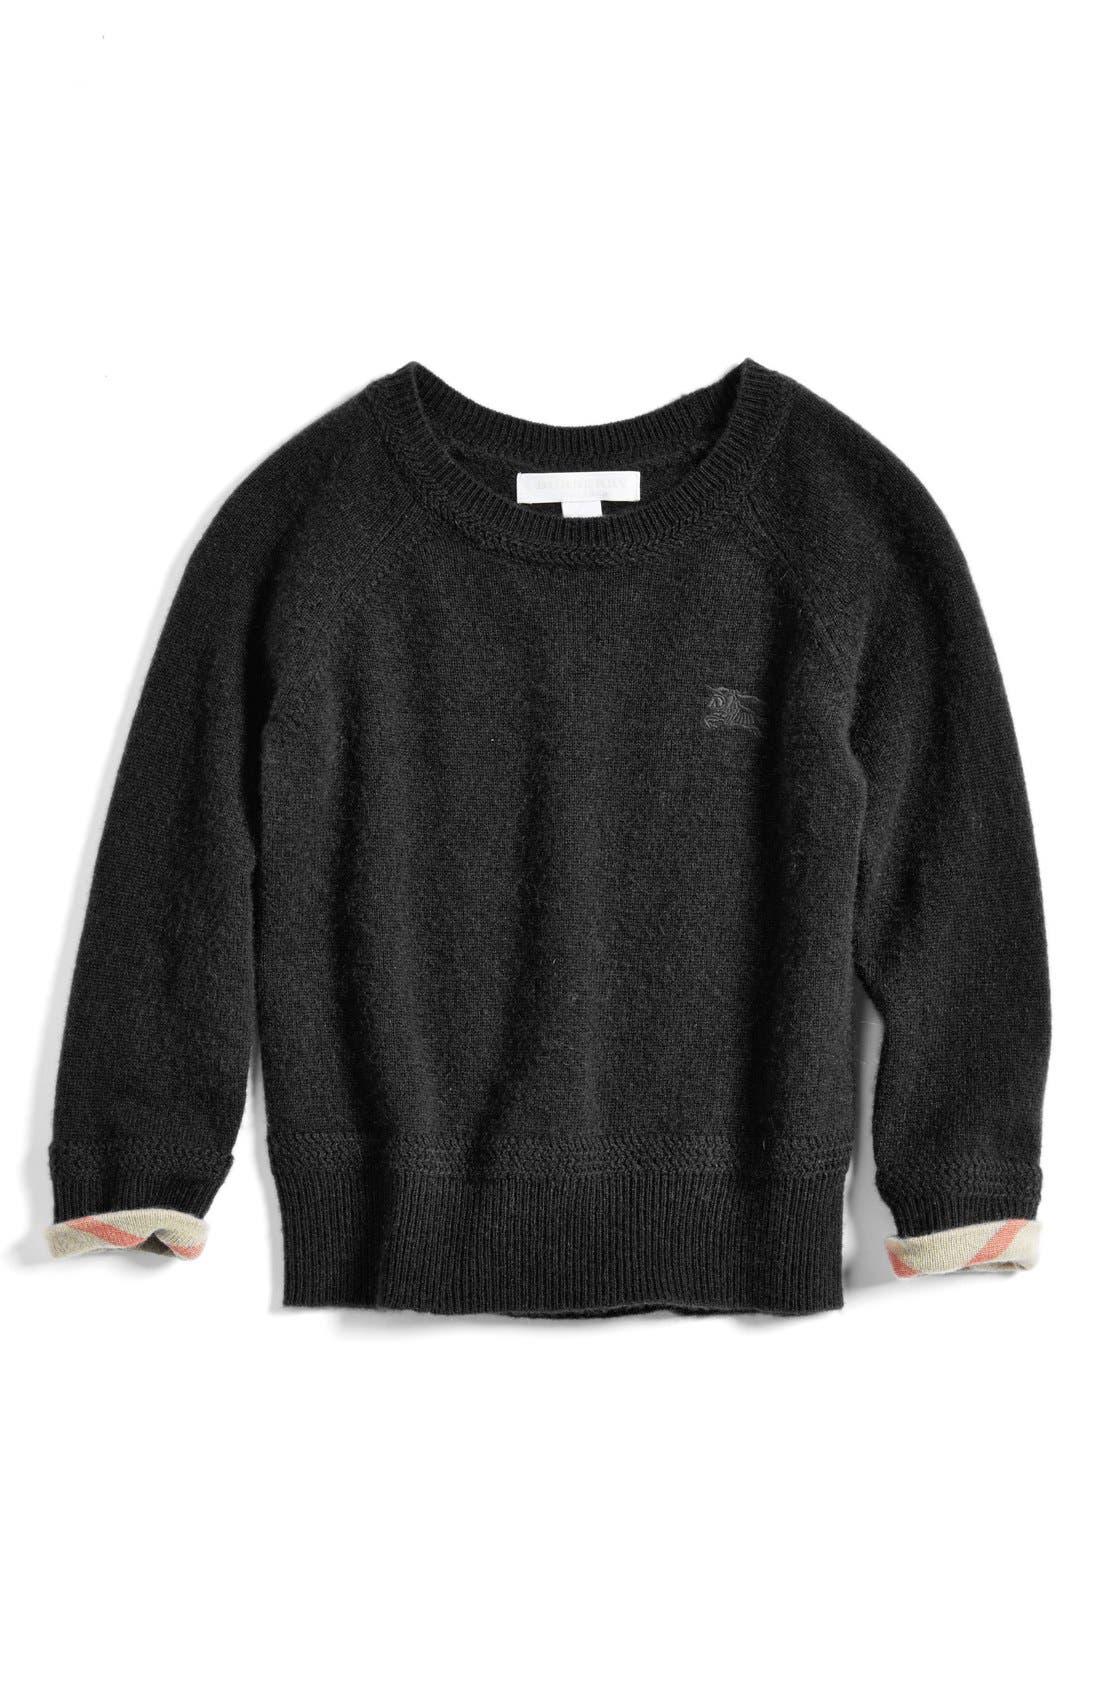 Check Cuff Cashmere Sweater,                             Main thumbnail 1, color,                             001